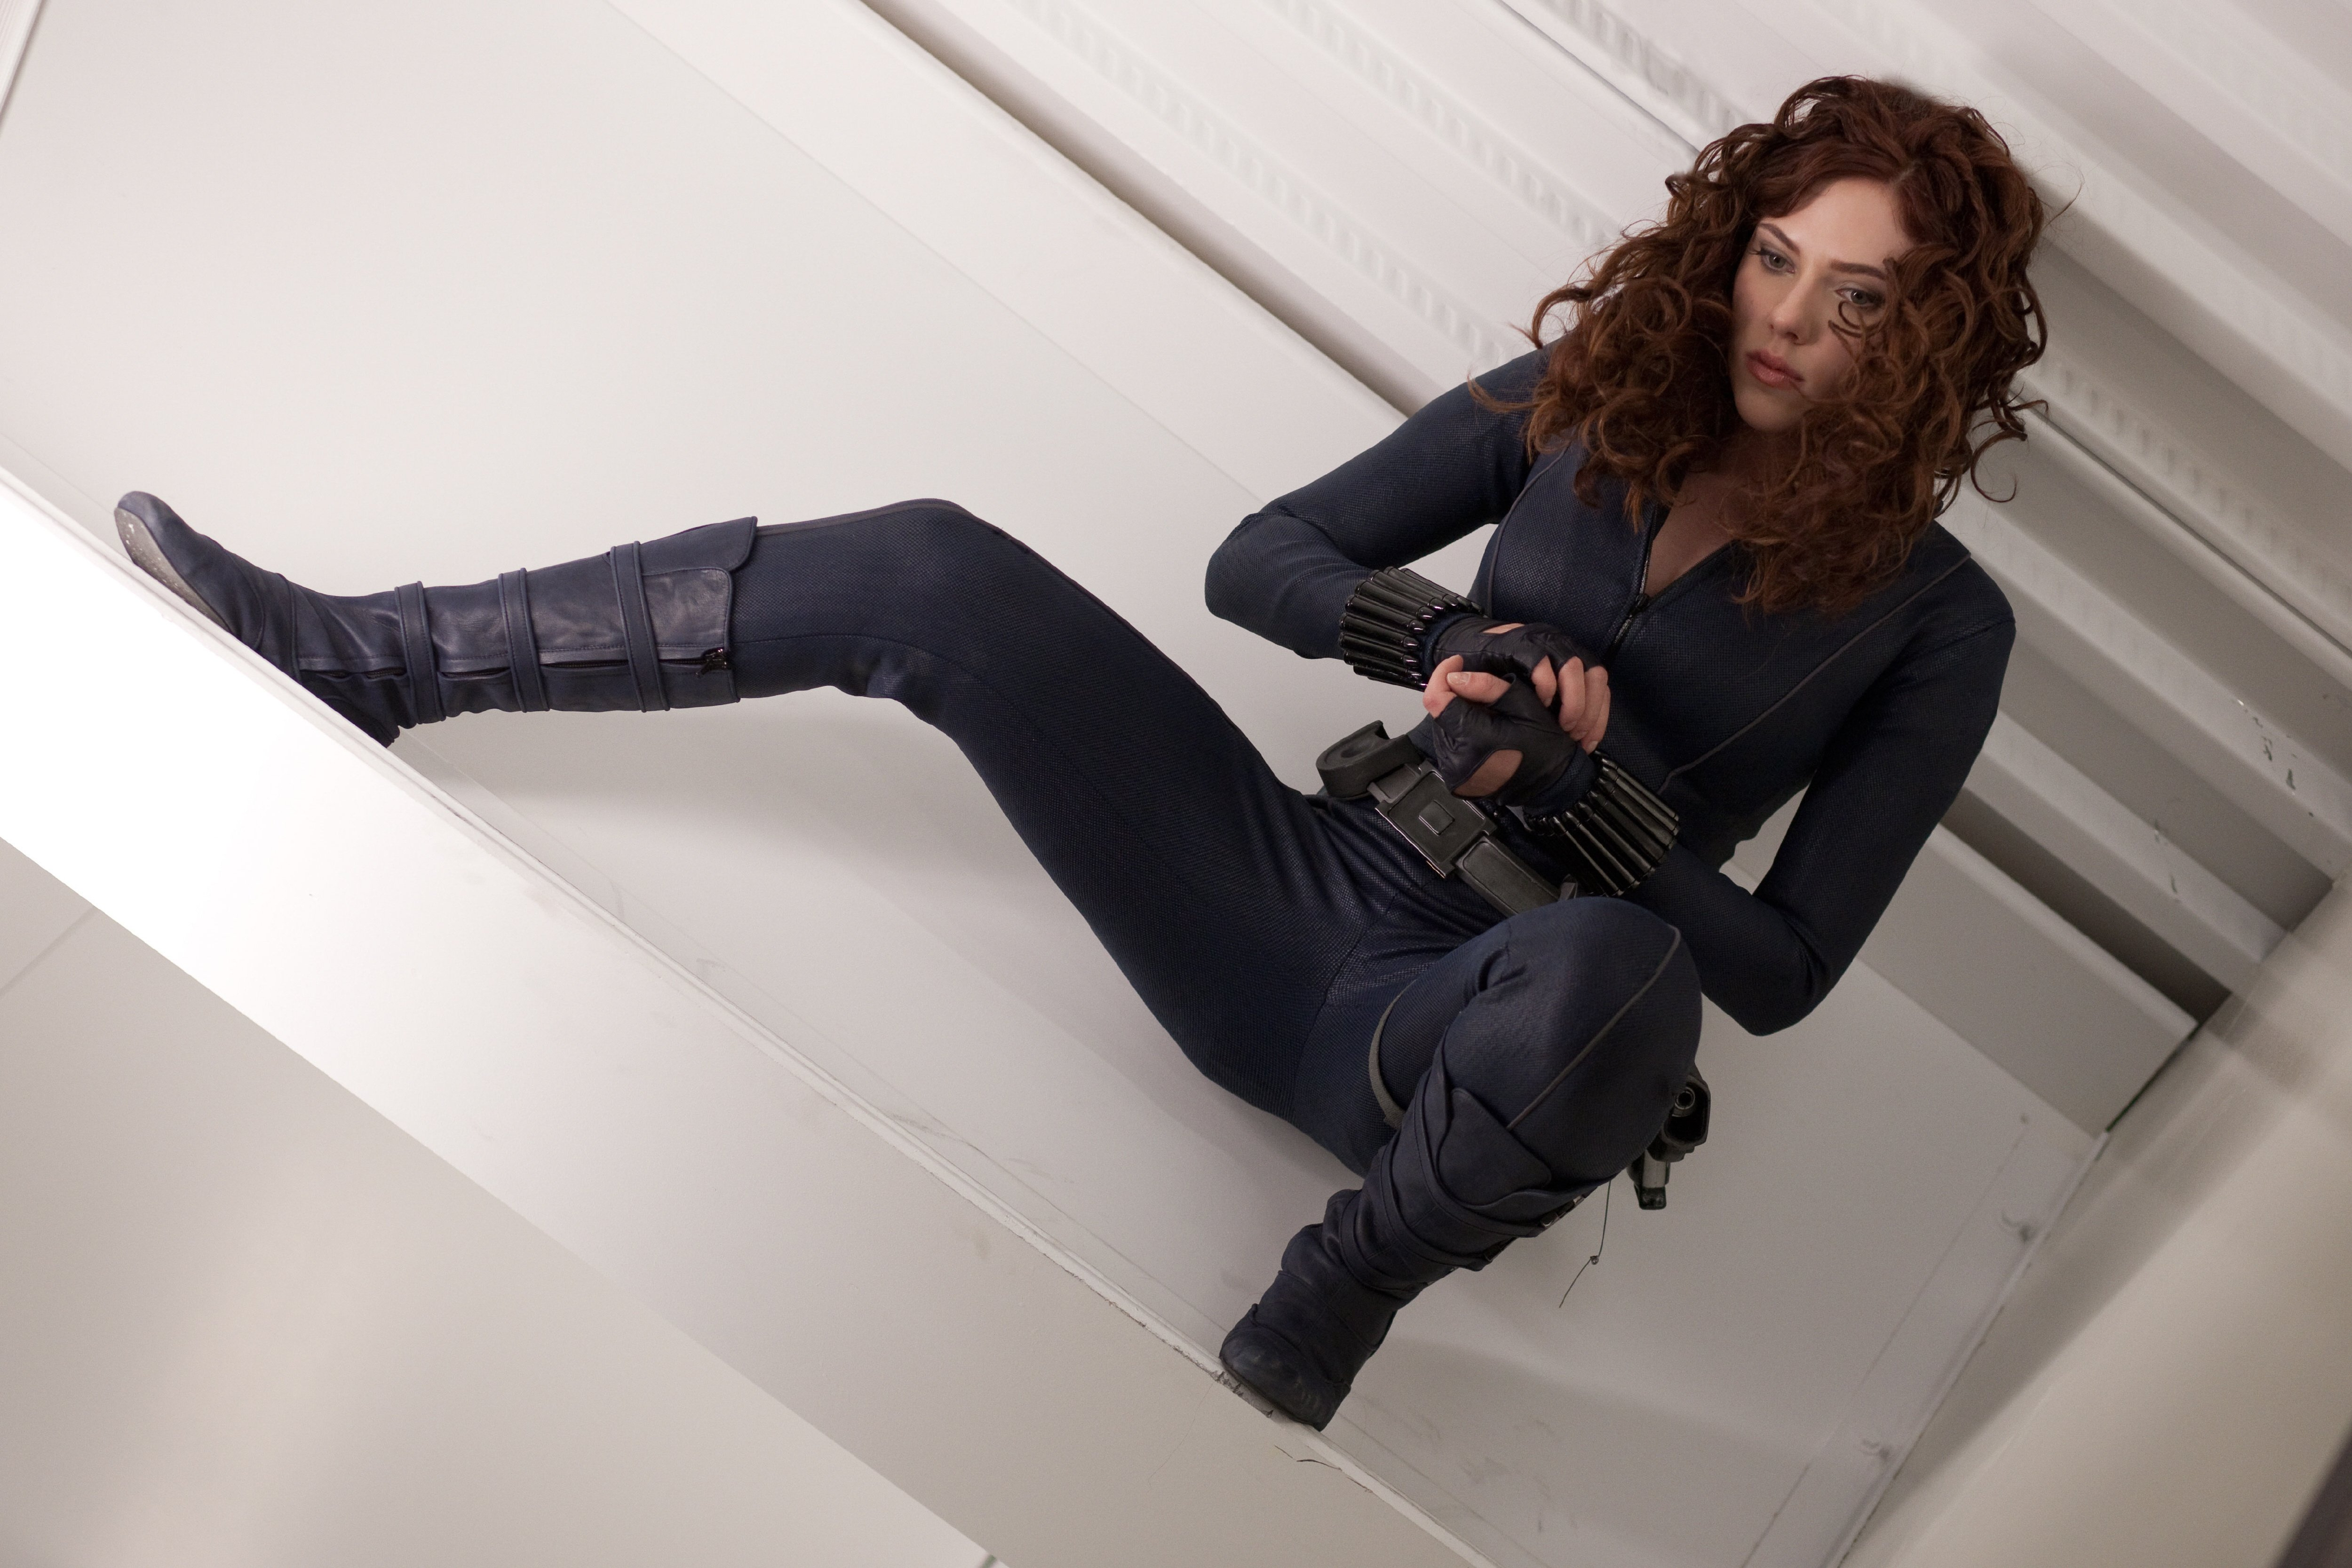 movies Black Widow Scarlett Johansson Iron Man Wallpapers HD